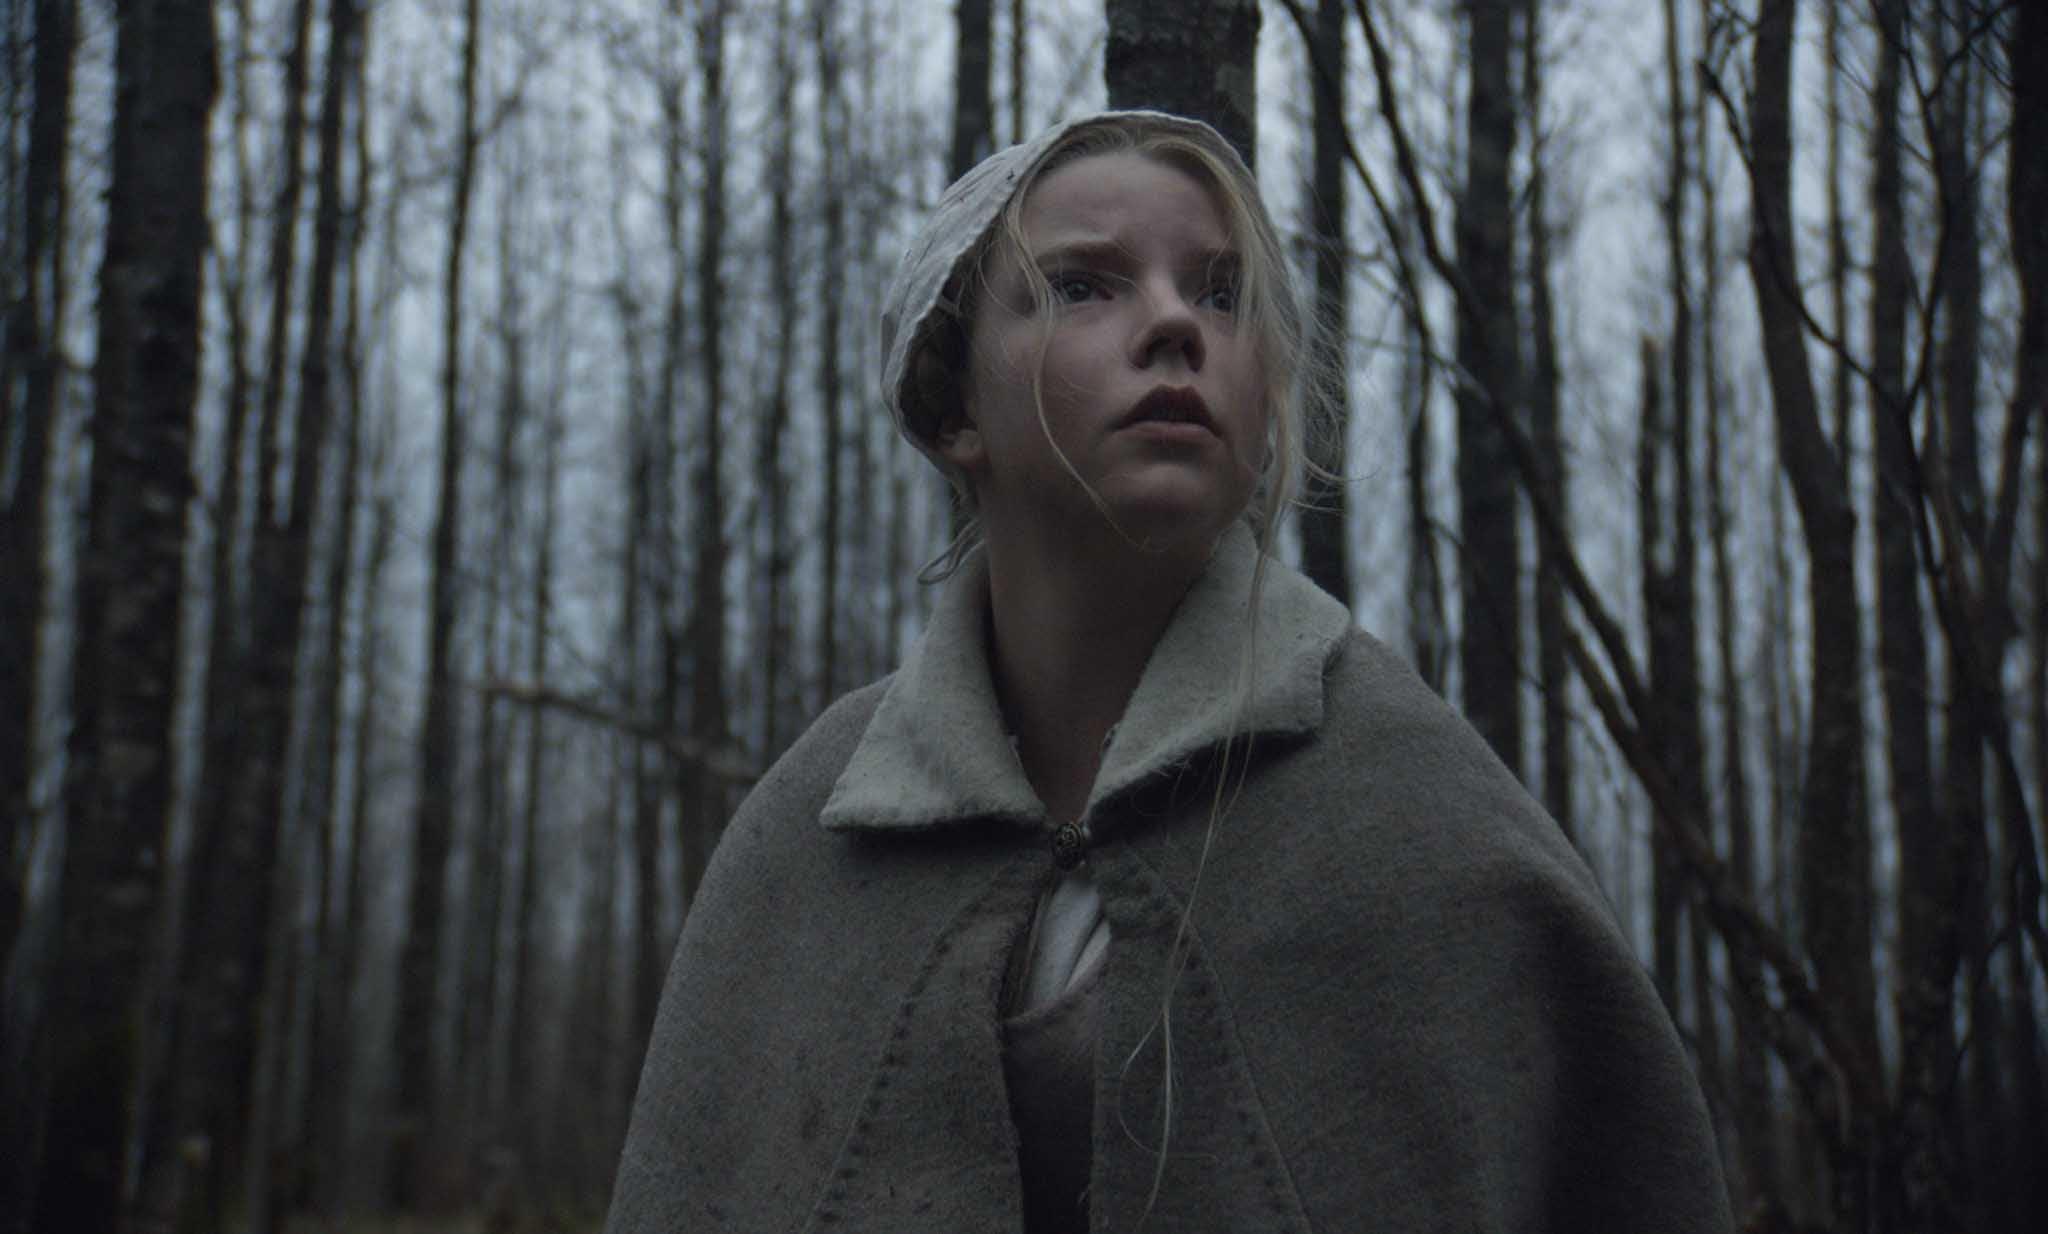 La Bruja (The Witch)